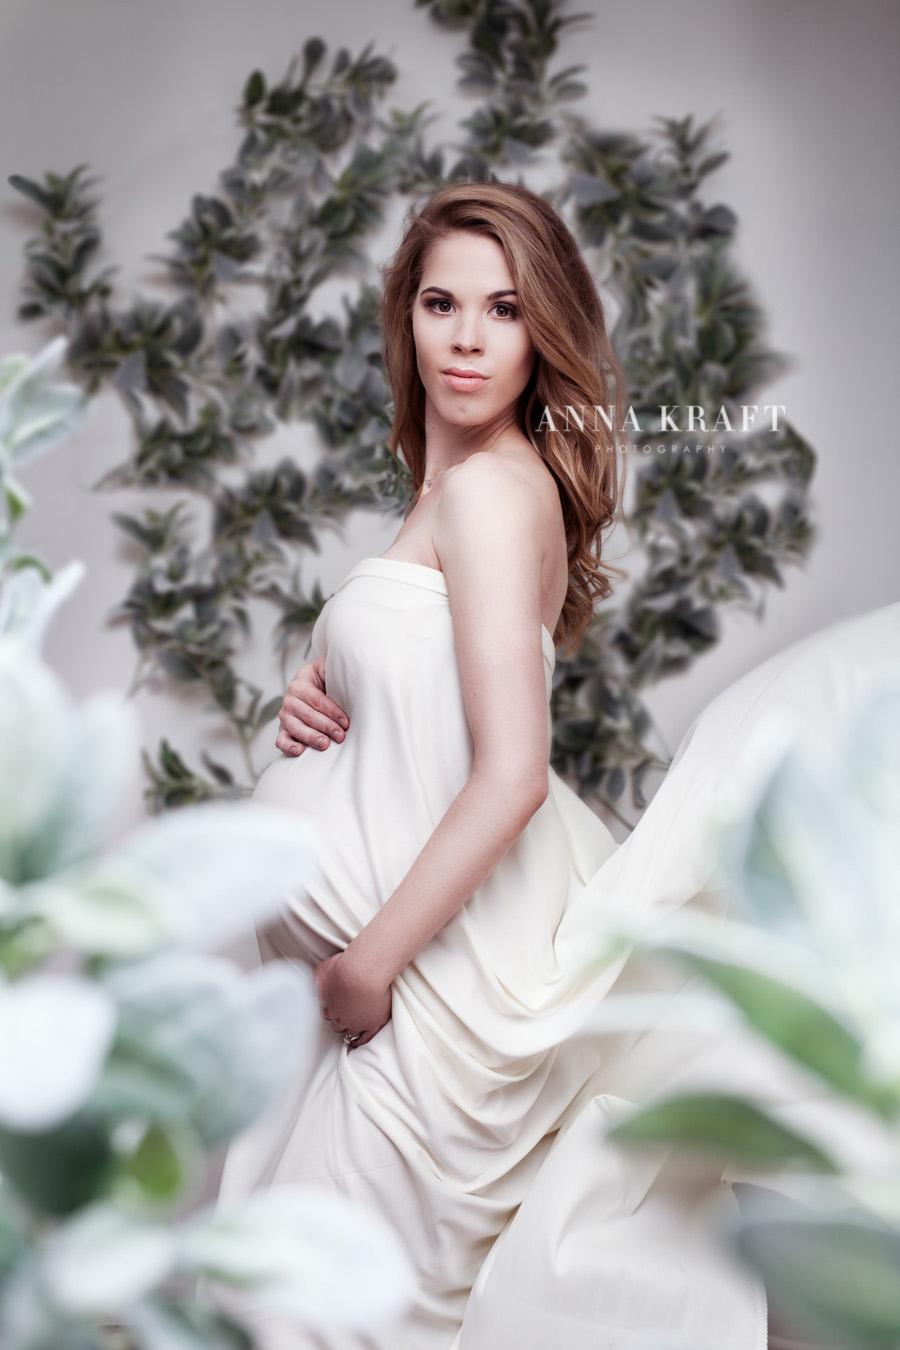 anna_kraft_photography_georgetown_square_studio_maternity_photo-1.jpg